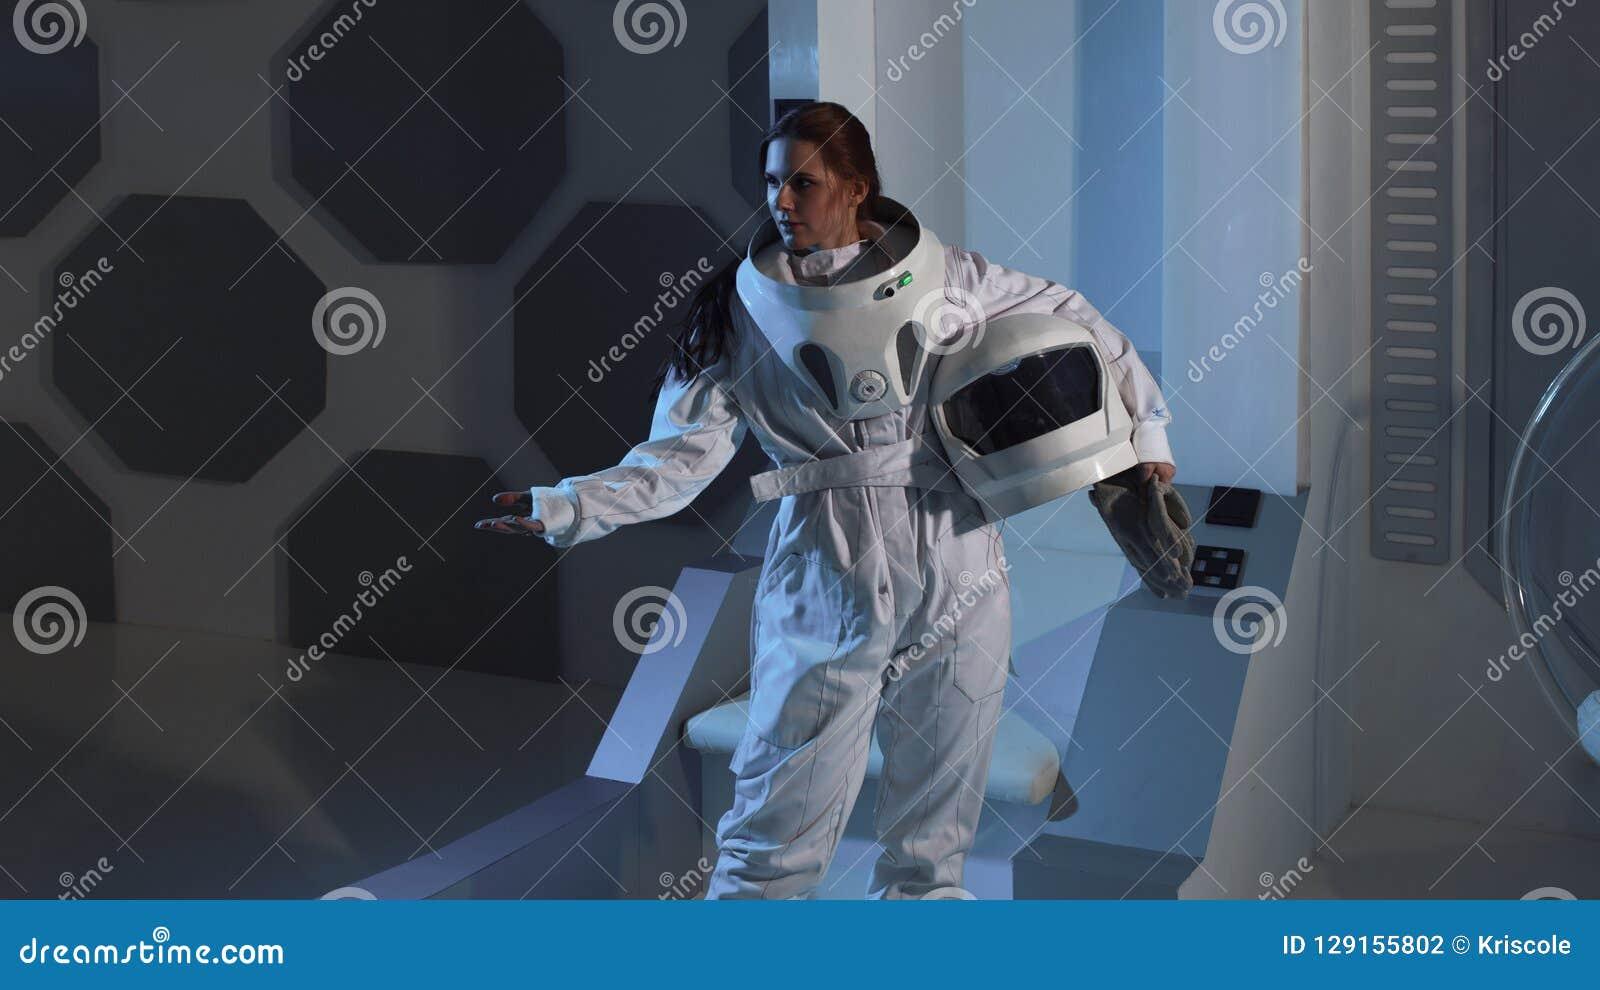 woman astronaut in diaper - HD1600×990